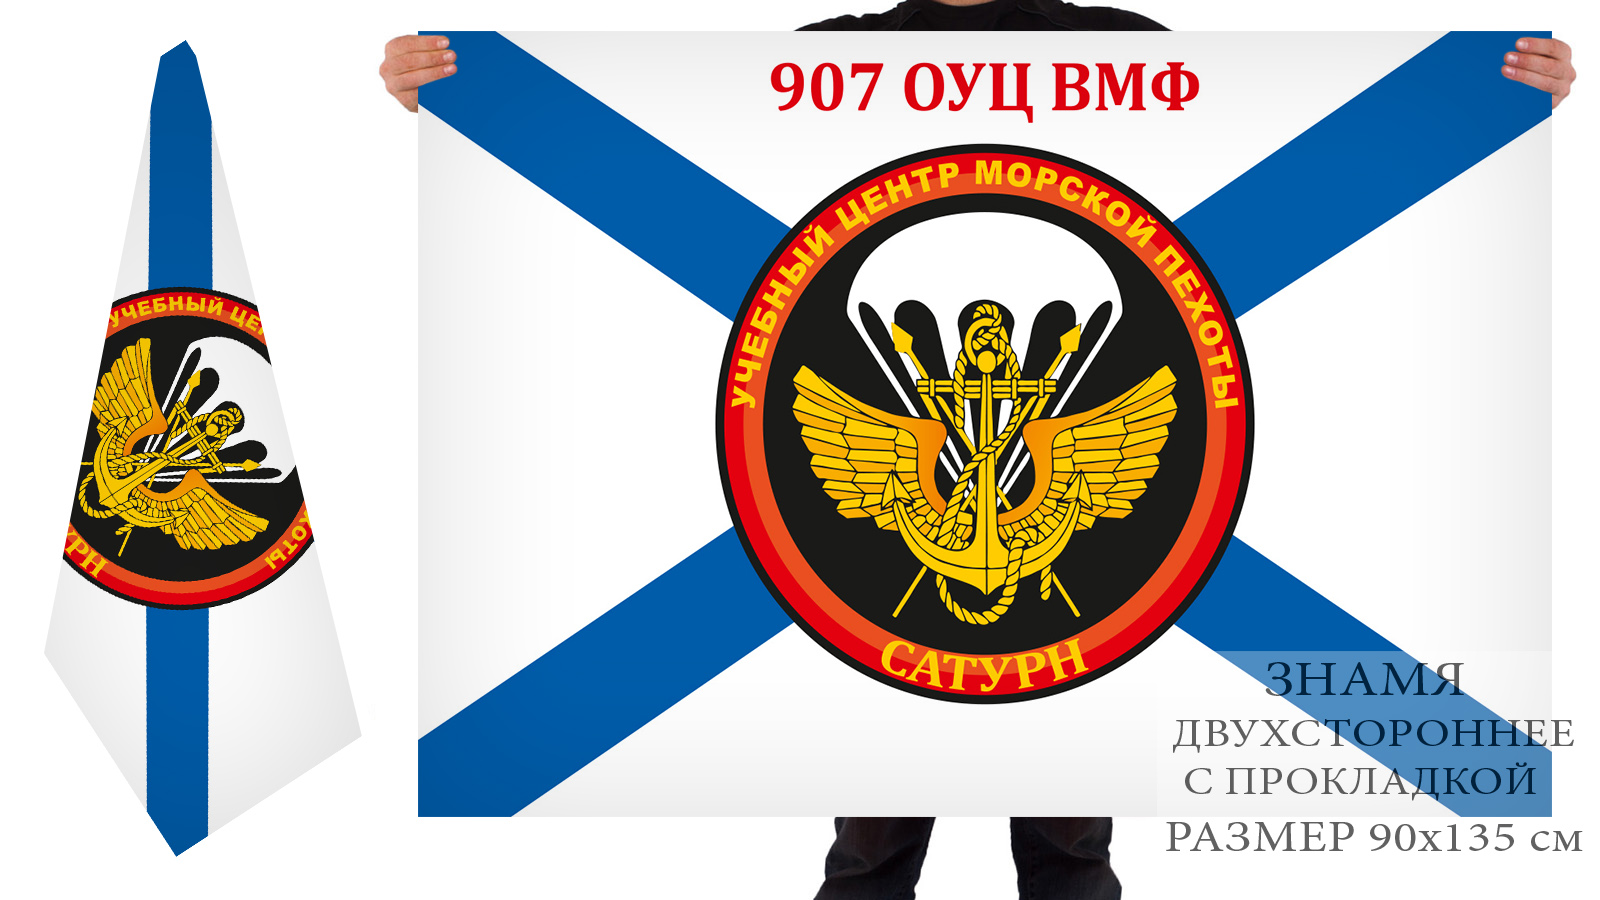 Двухсторонний флаг учебного центра Морской пехоты «907 ОУЦ ВМФ Сатурн»